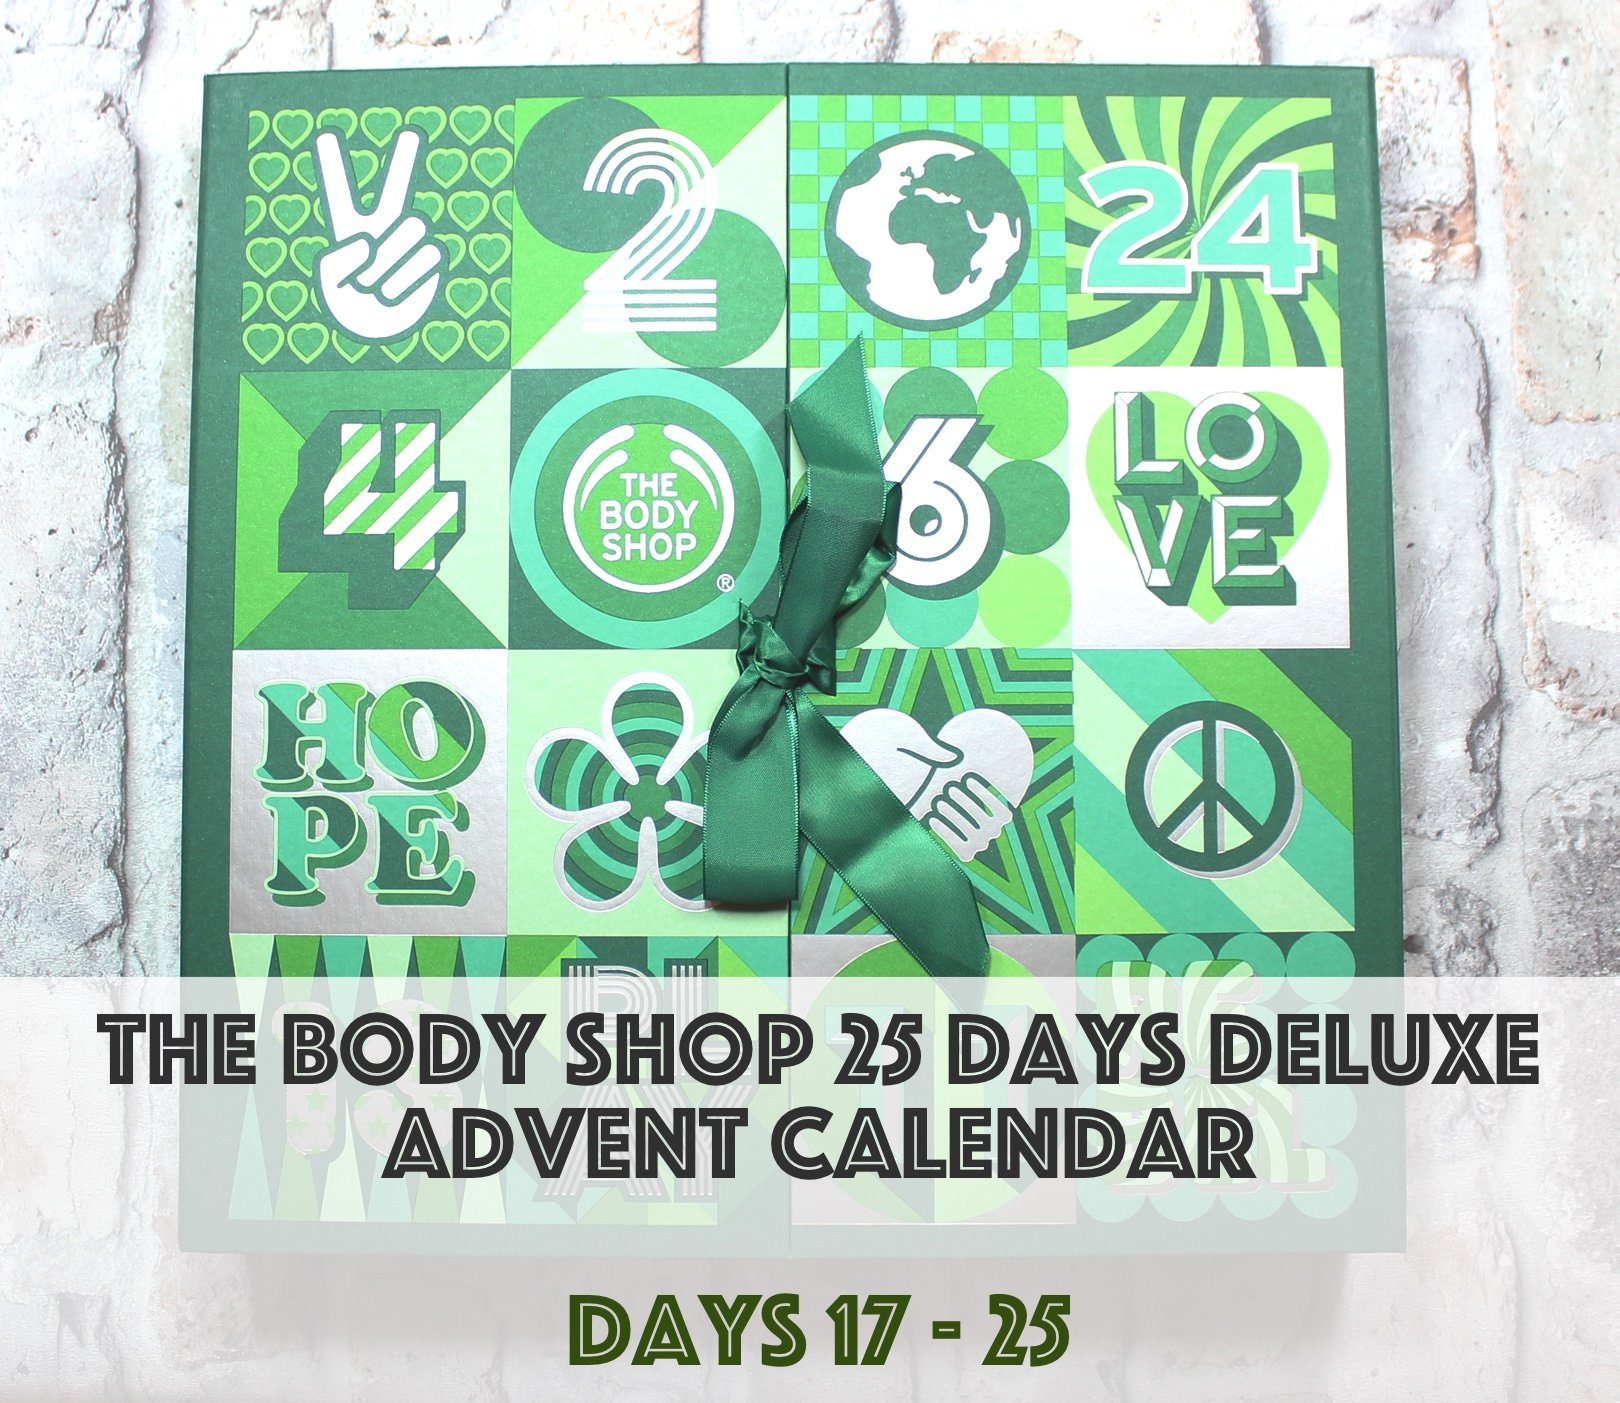 The Body Shop Deluxe Advent Calendar: Days 17-25